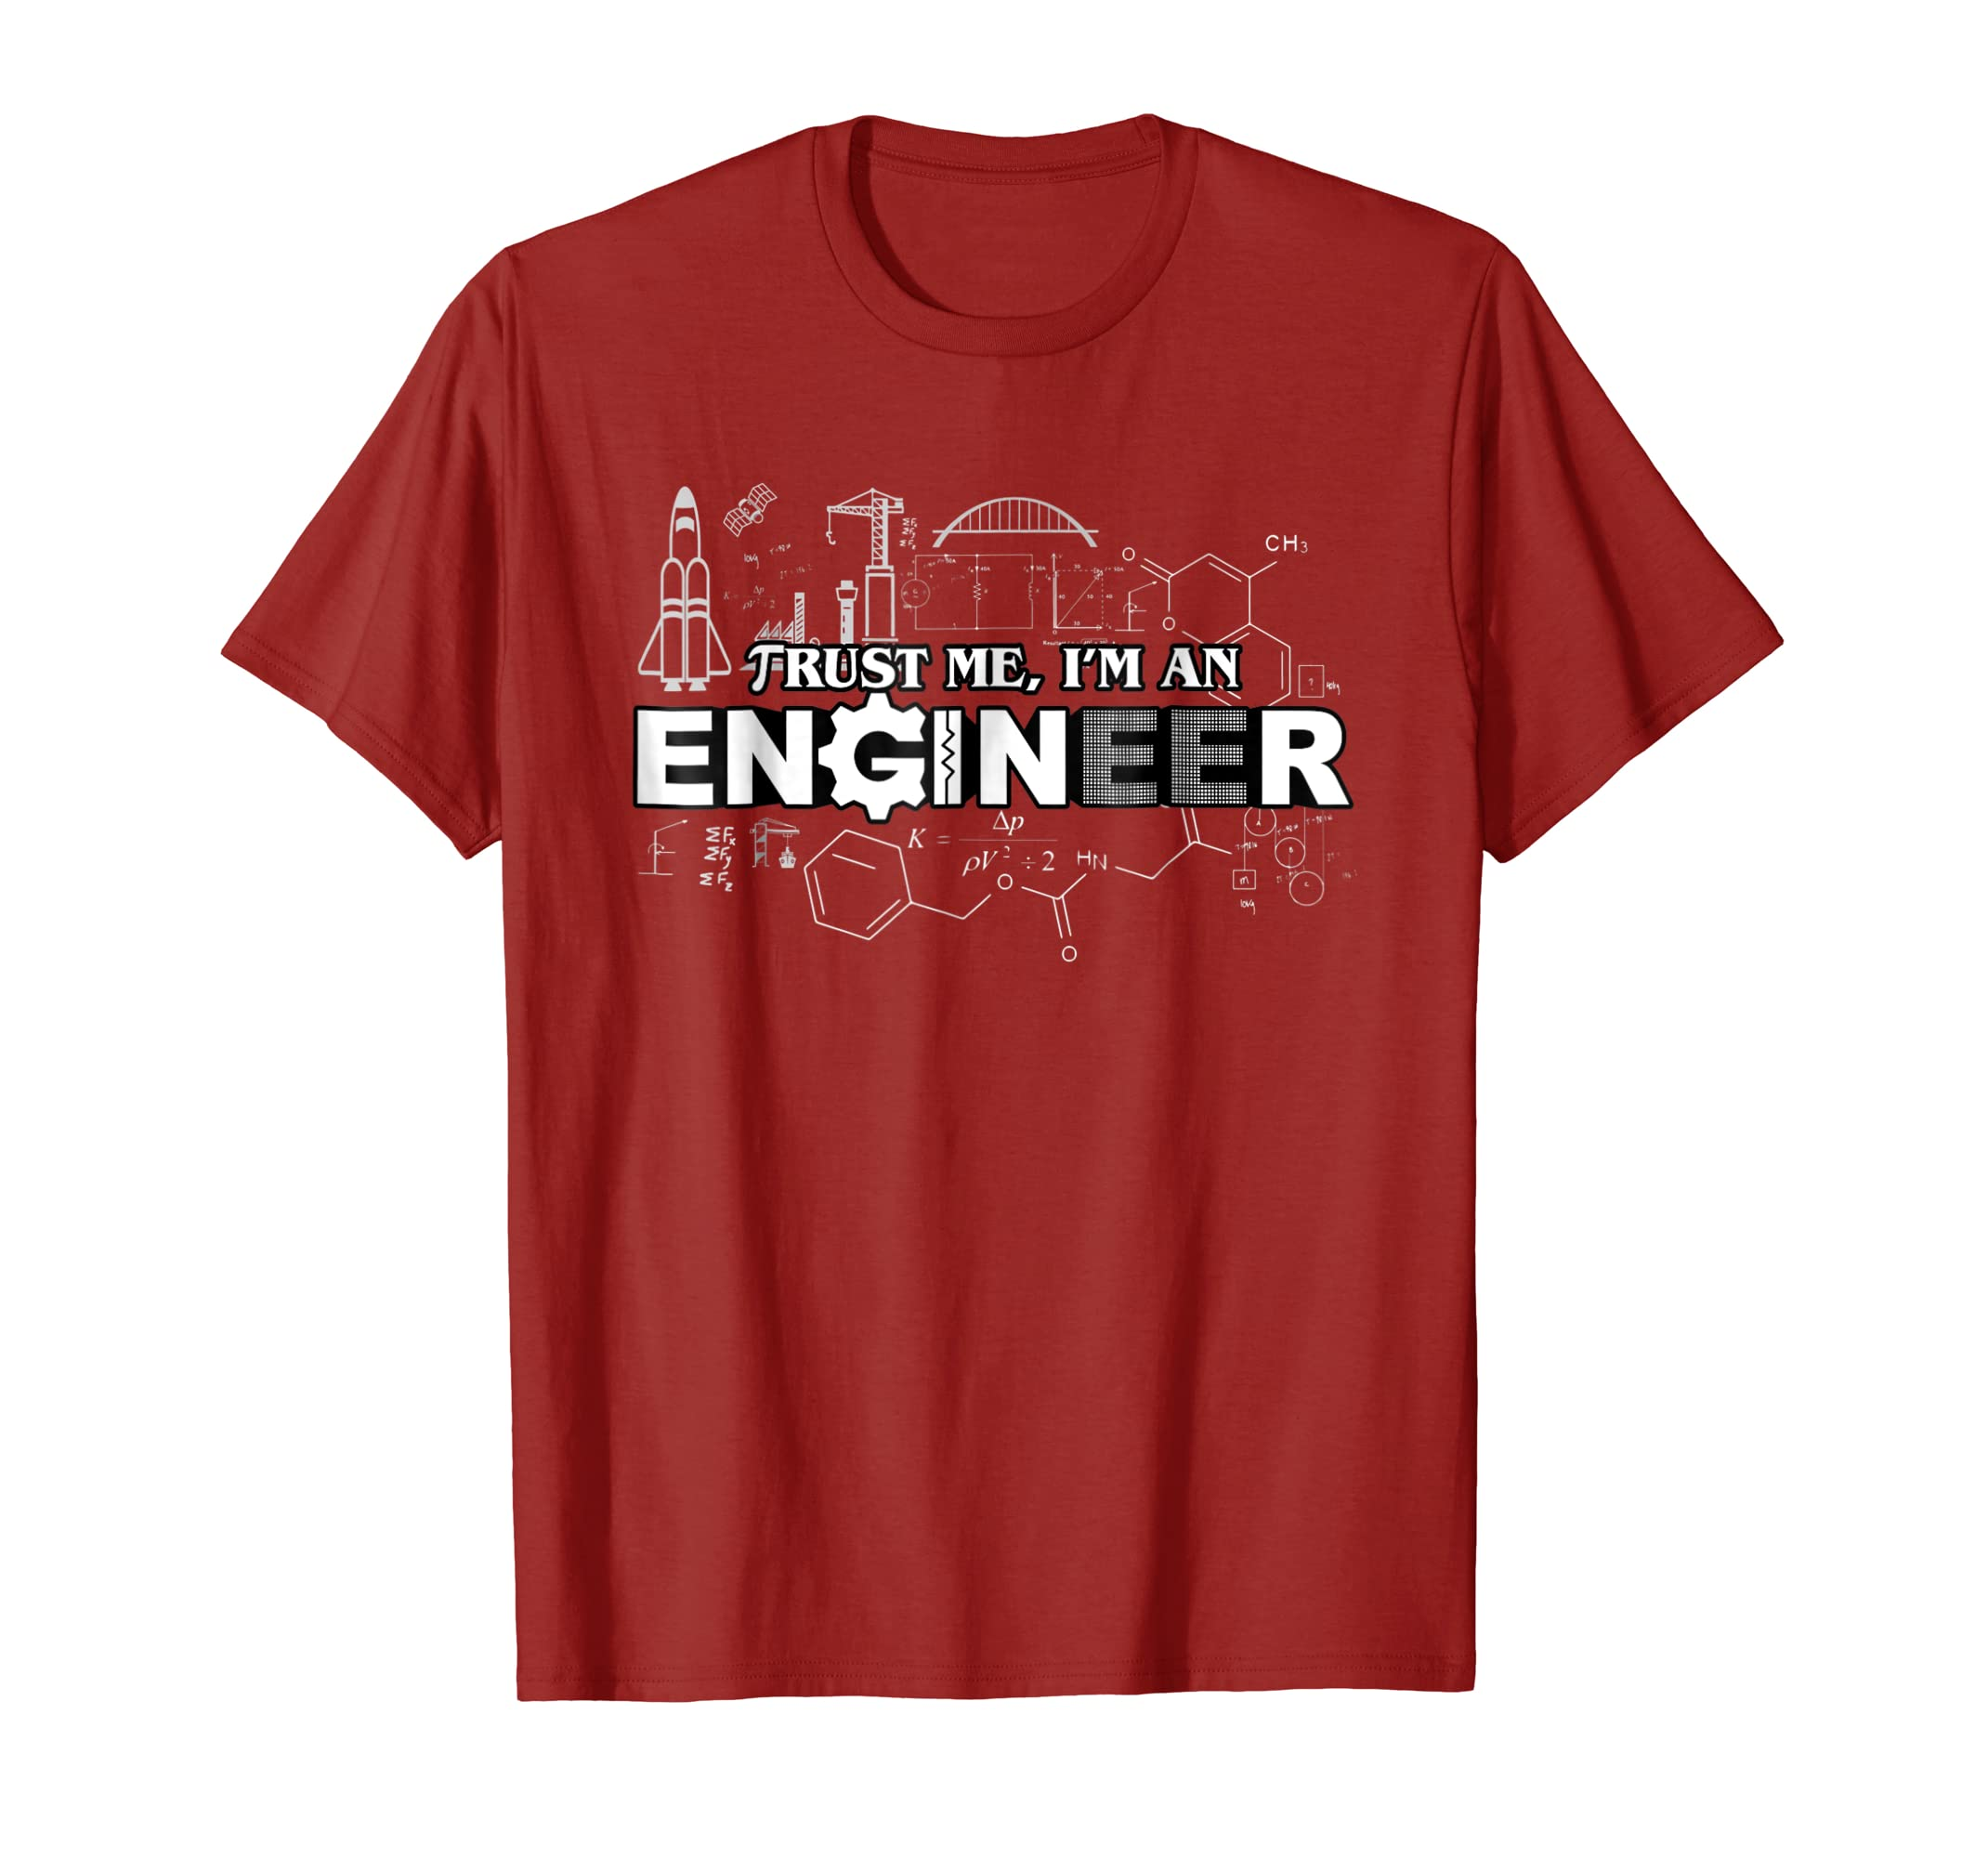 Trust Me I'm An Engineer T Shirt-Teechatpro